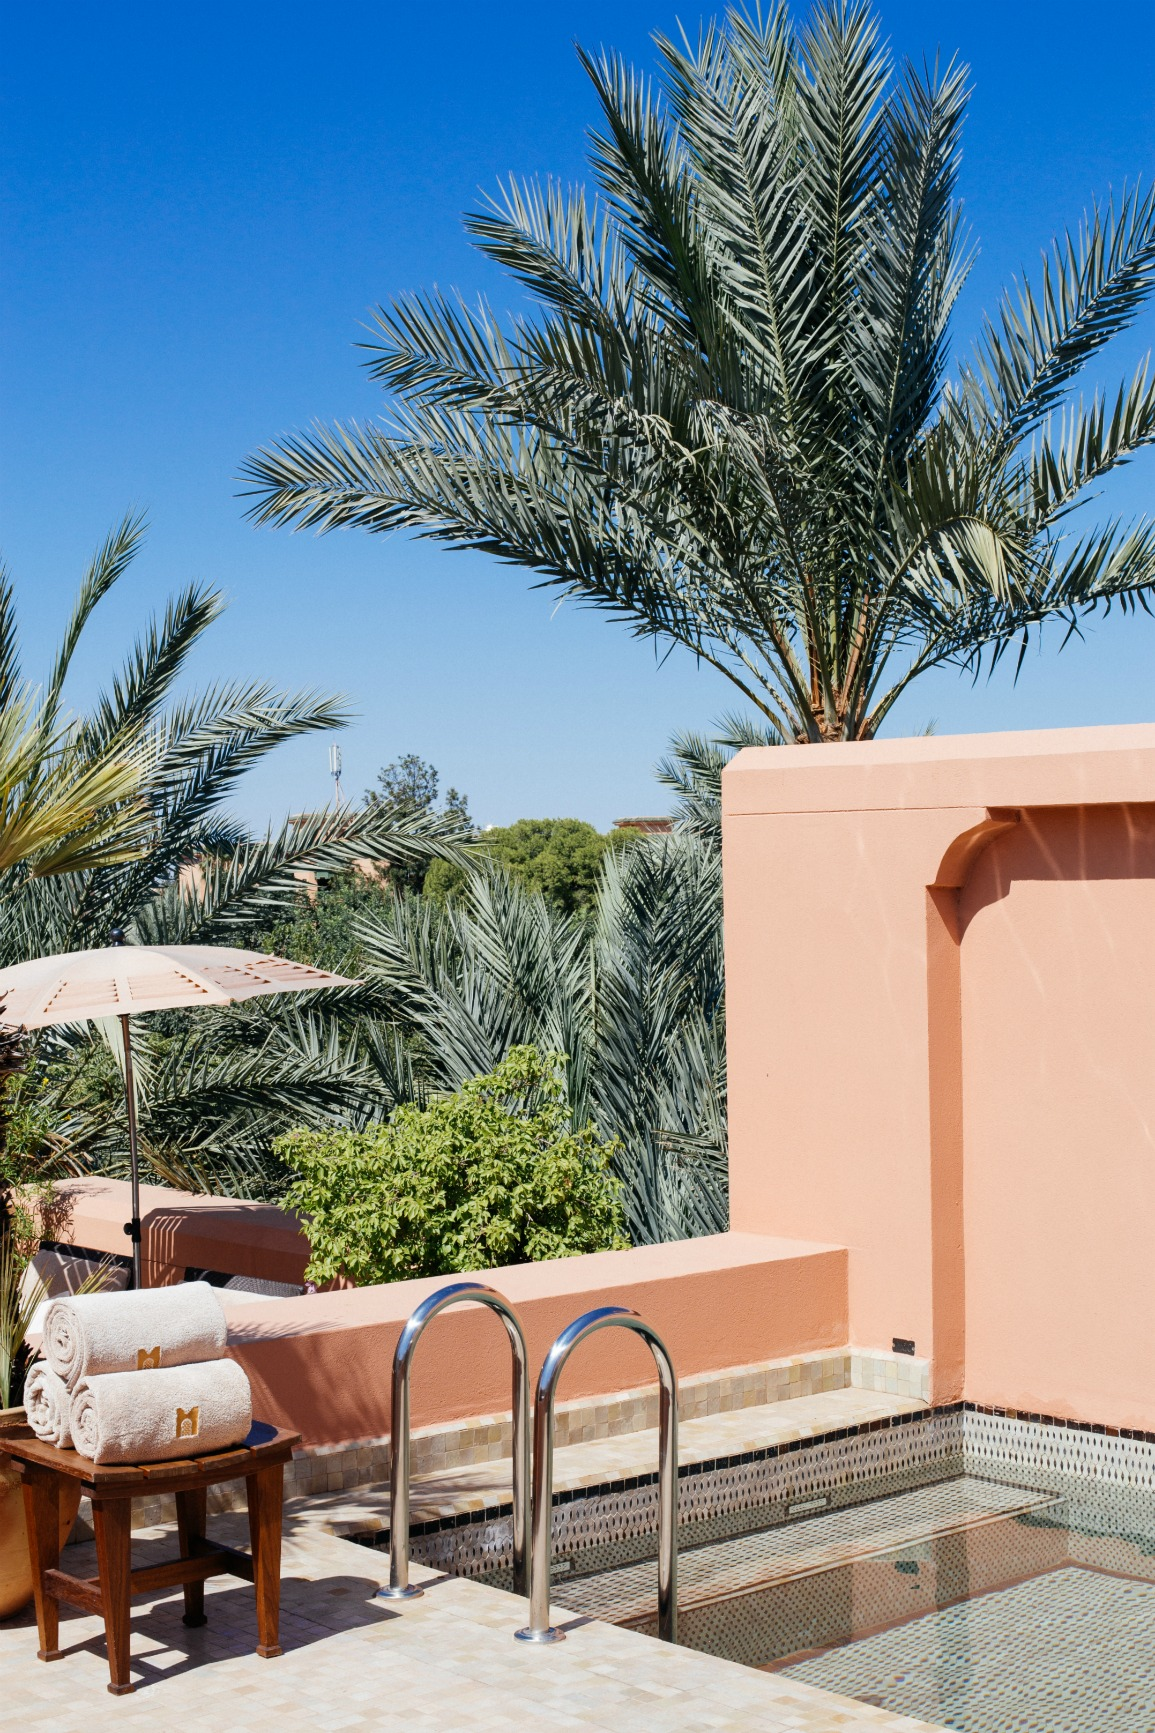 royal-mansour-hotel-luxury-marrakesch-marrakesh-morocco-edisa-shahini-disicouture-blog-02